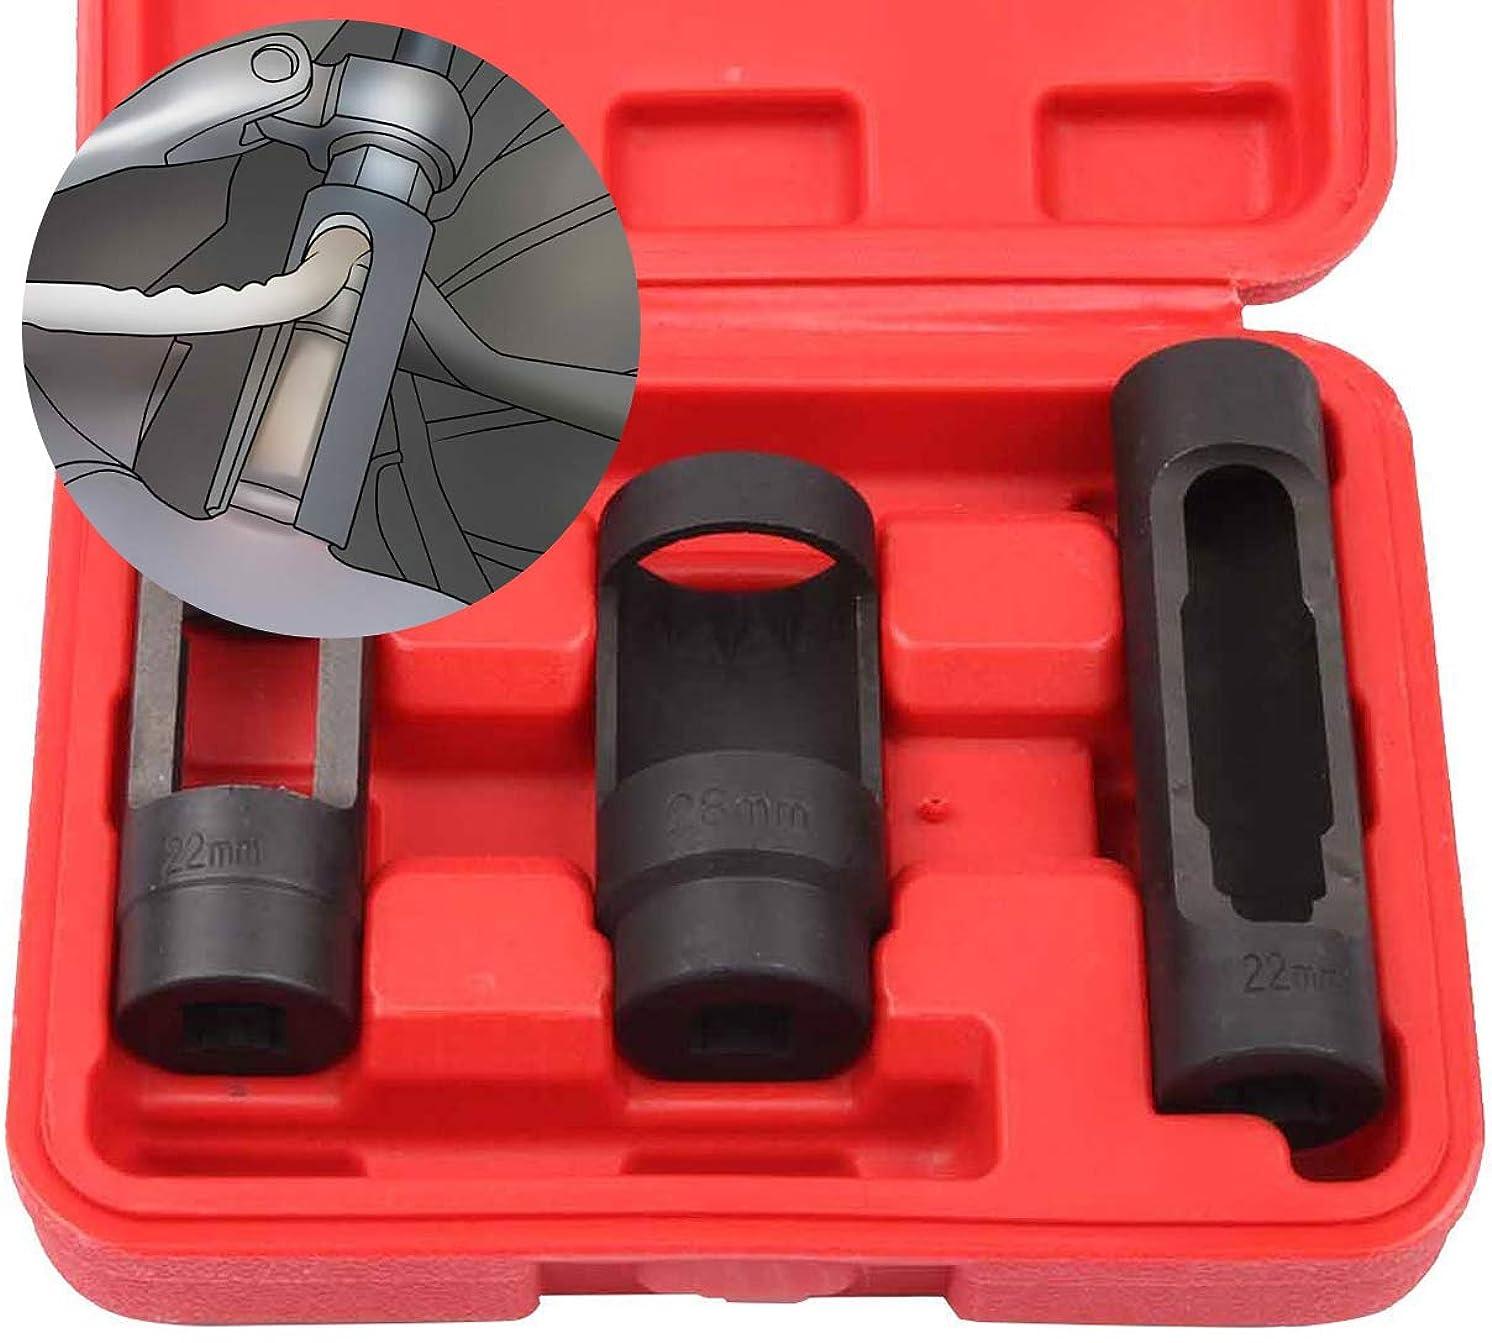 Diesel Oxygen Sensor Remover Tool Kit Set - 3 Piece Socket Set for Fuel Injectors - 22mm / 28mm Universal Injector SocketS Wrench Tool Kit for 02 Sensors - Professional Grade Removal Too